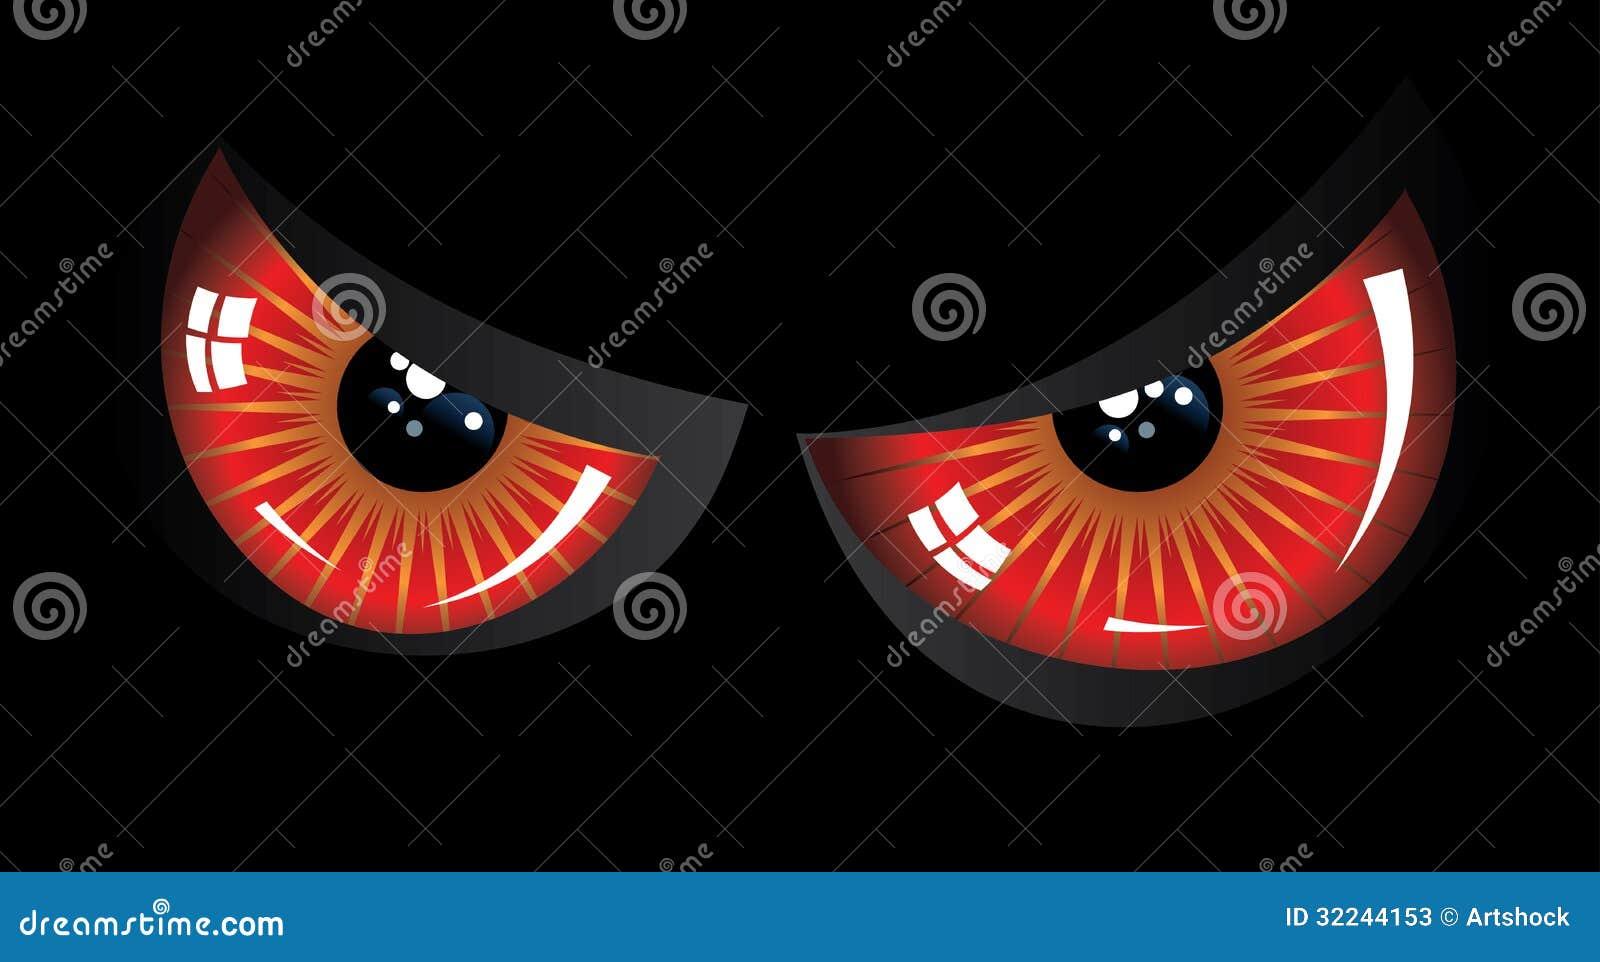 Red Eyes In Black Background